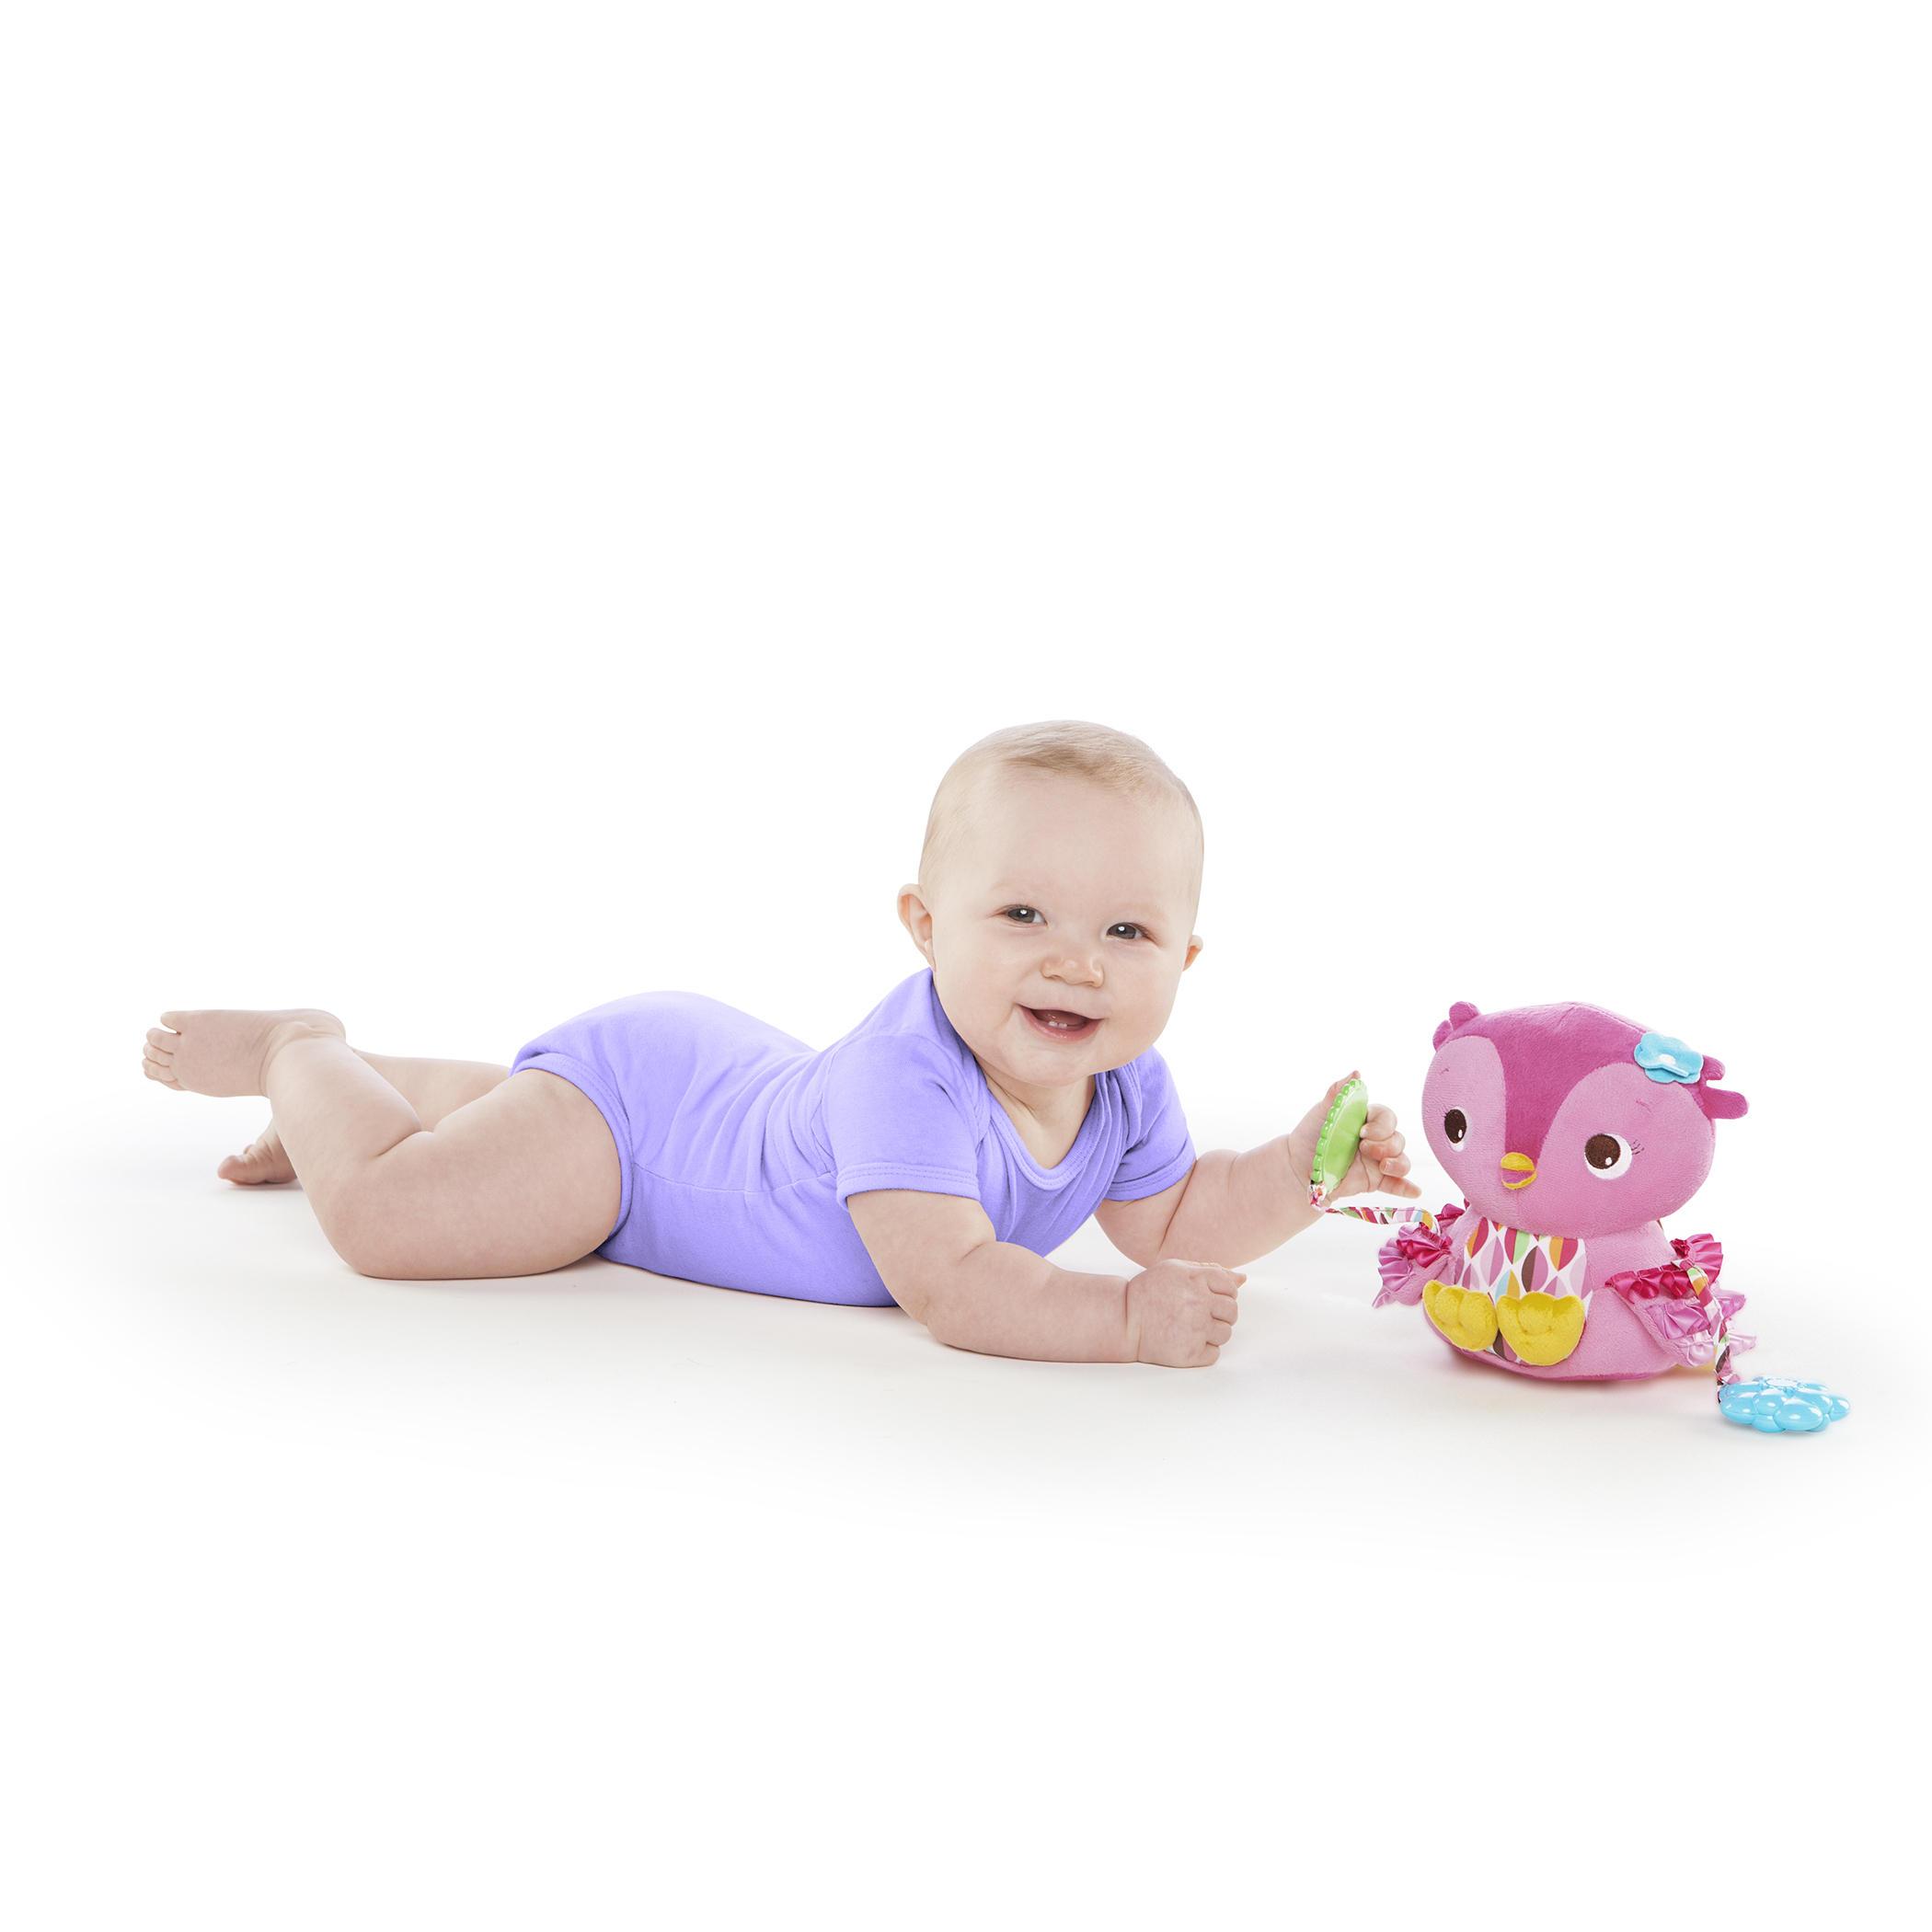 Hootie Cutie™ Plush Toy